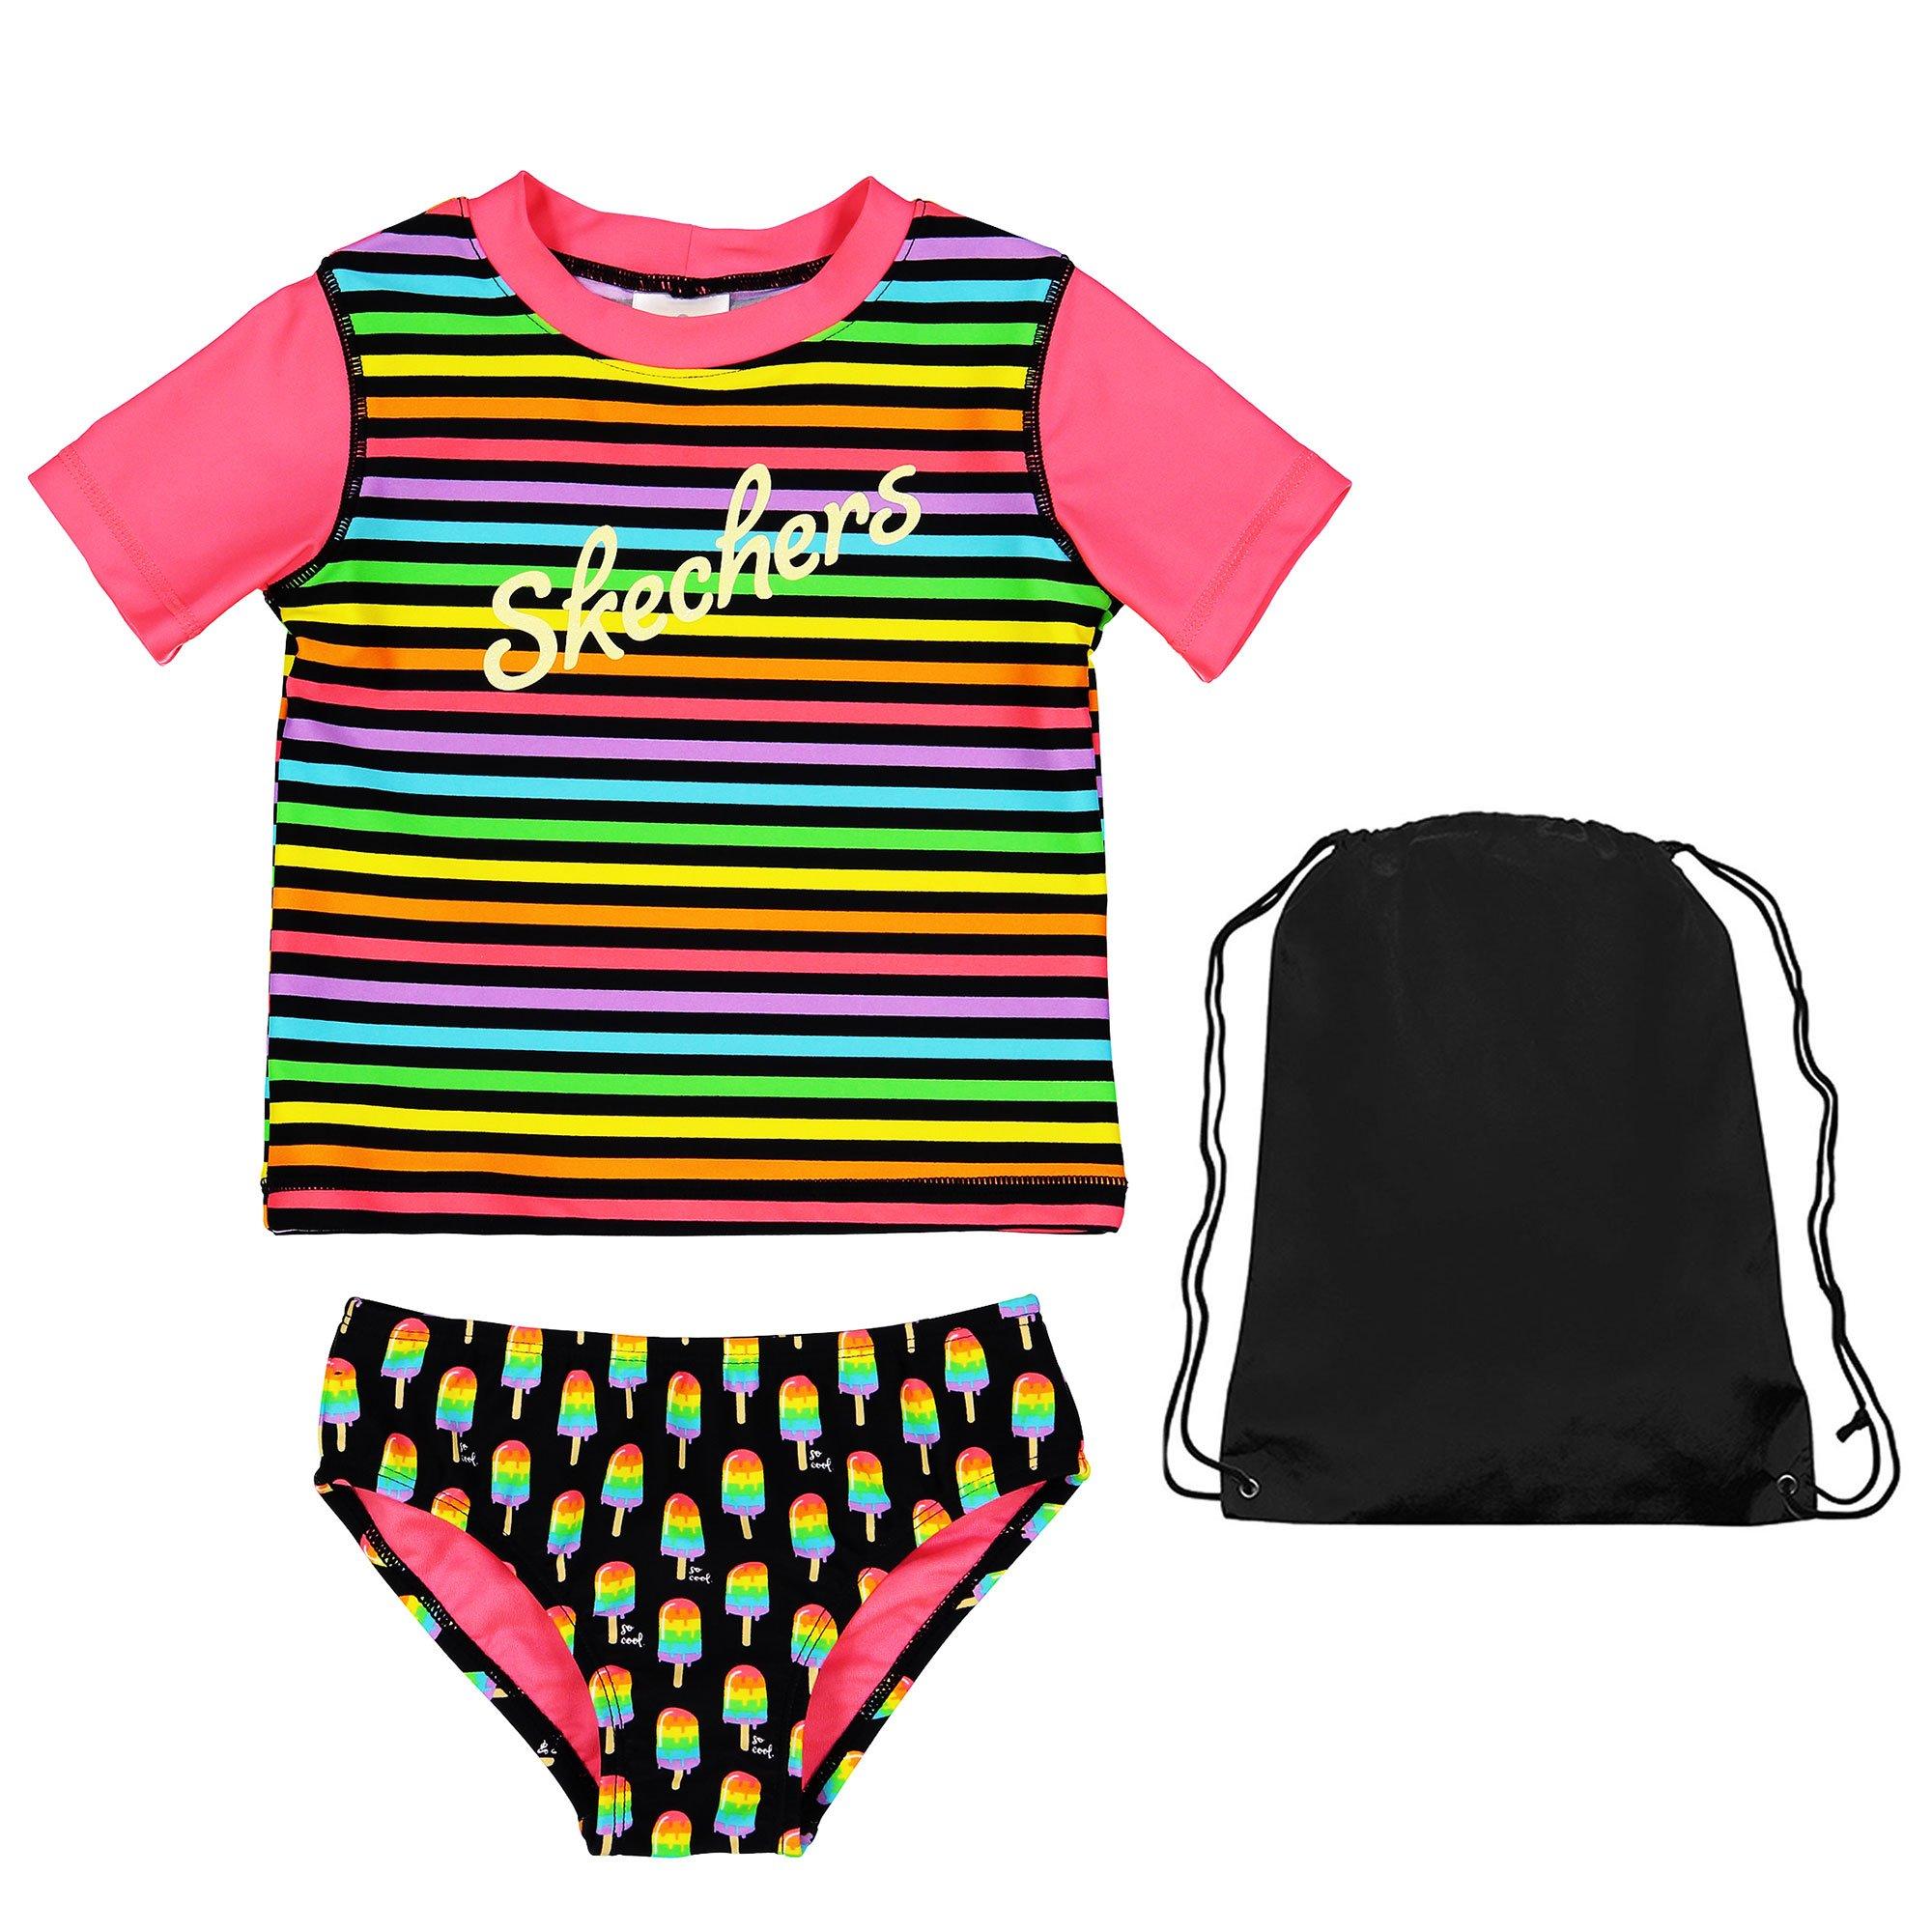 Skechers 2 Piece Swimsuit Striped Short Sleeve Rash Guard Popsicle Bikini Bottoms and Bag 4